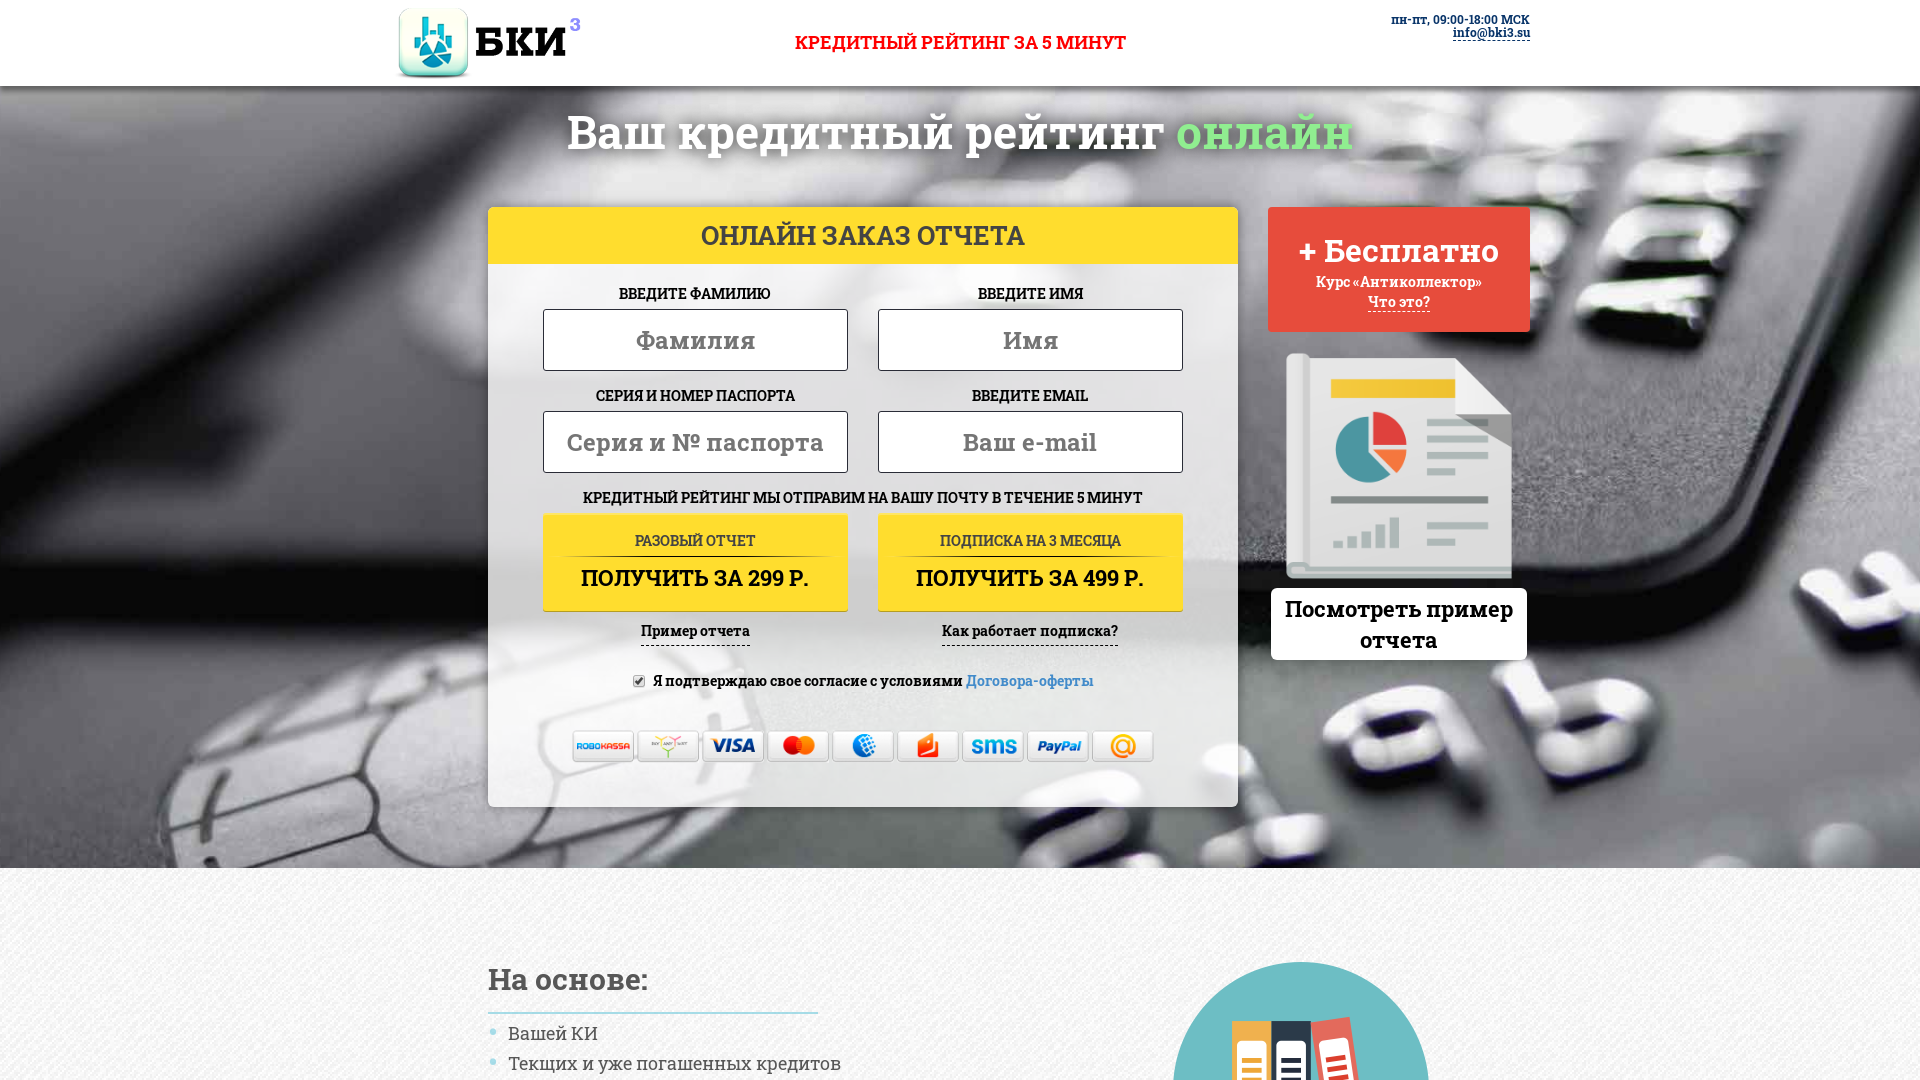 БКИ3 [CPS] RU website